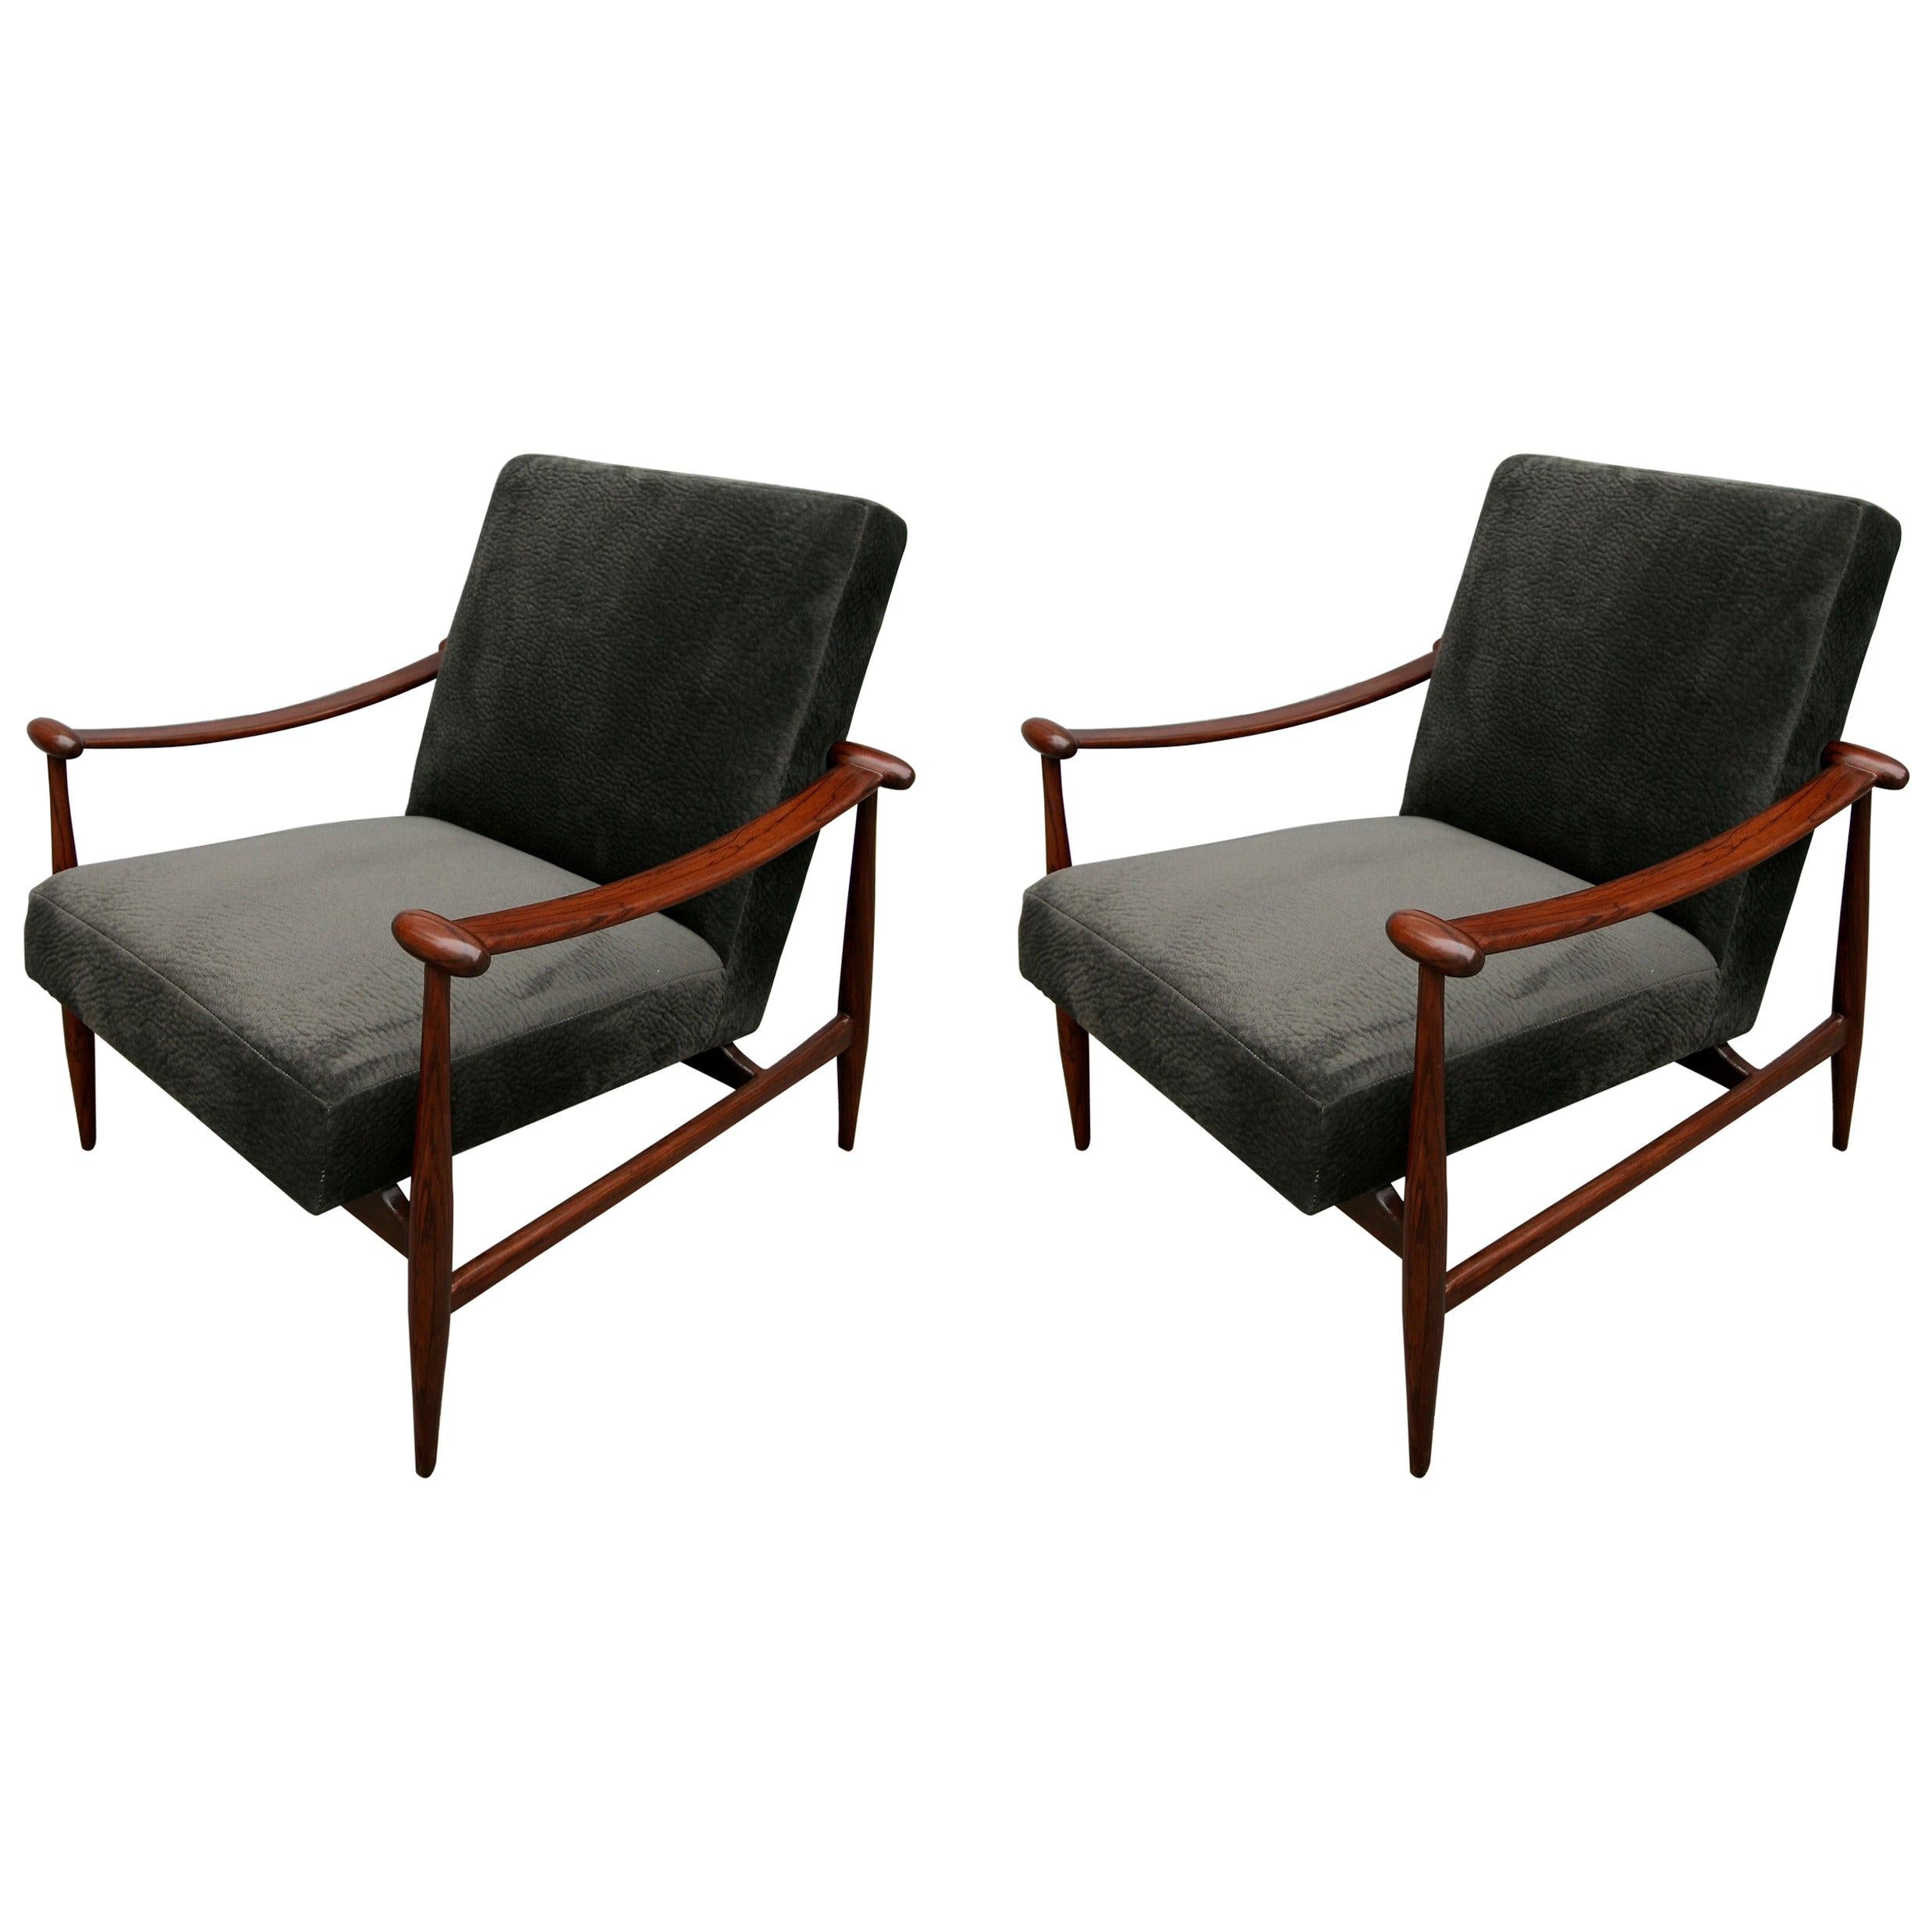 Pair of 1960s Brazilian Armchairs